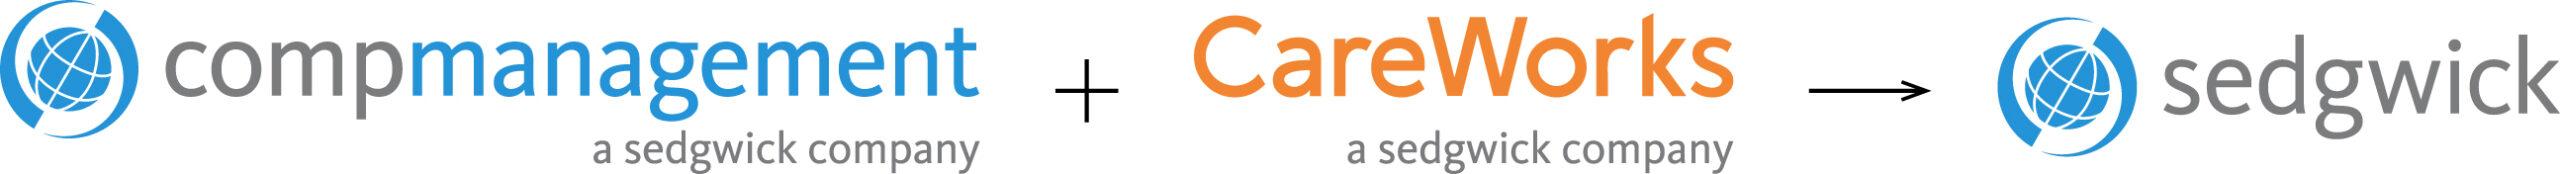 CareWorks-and-Segdwick-2